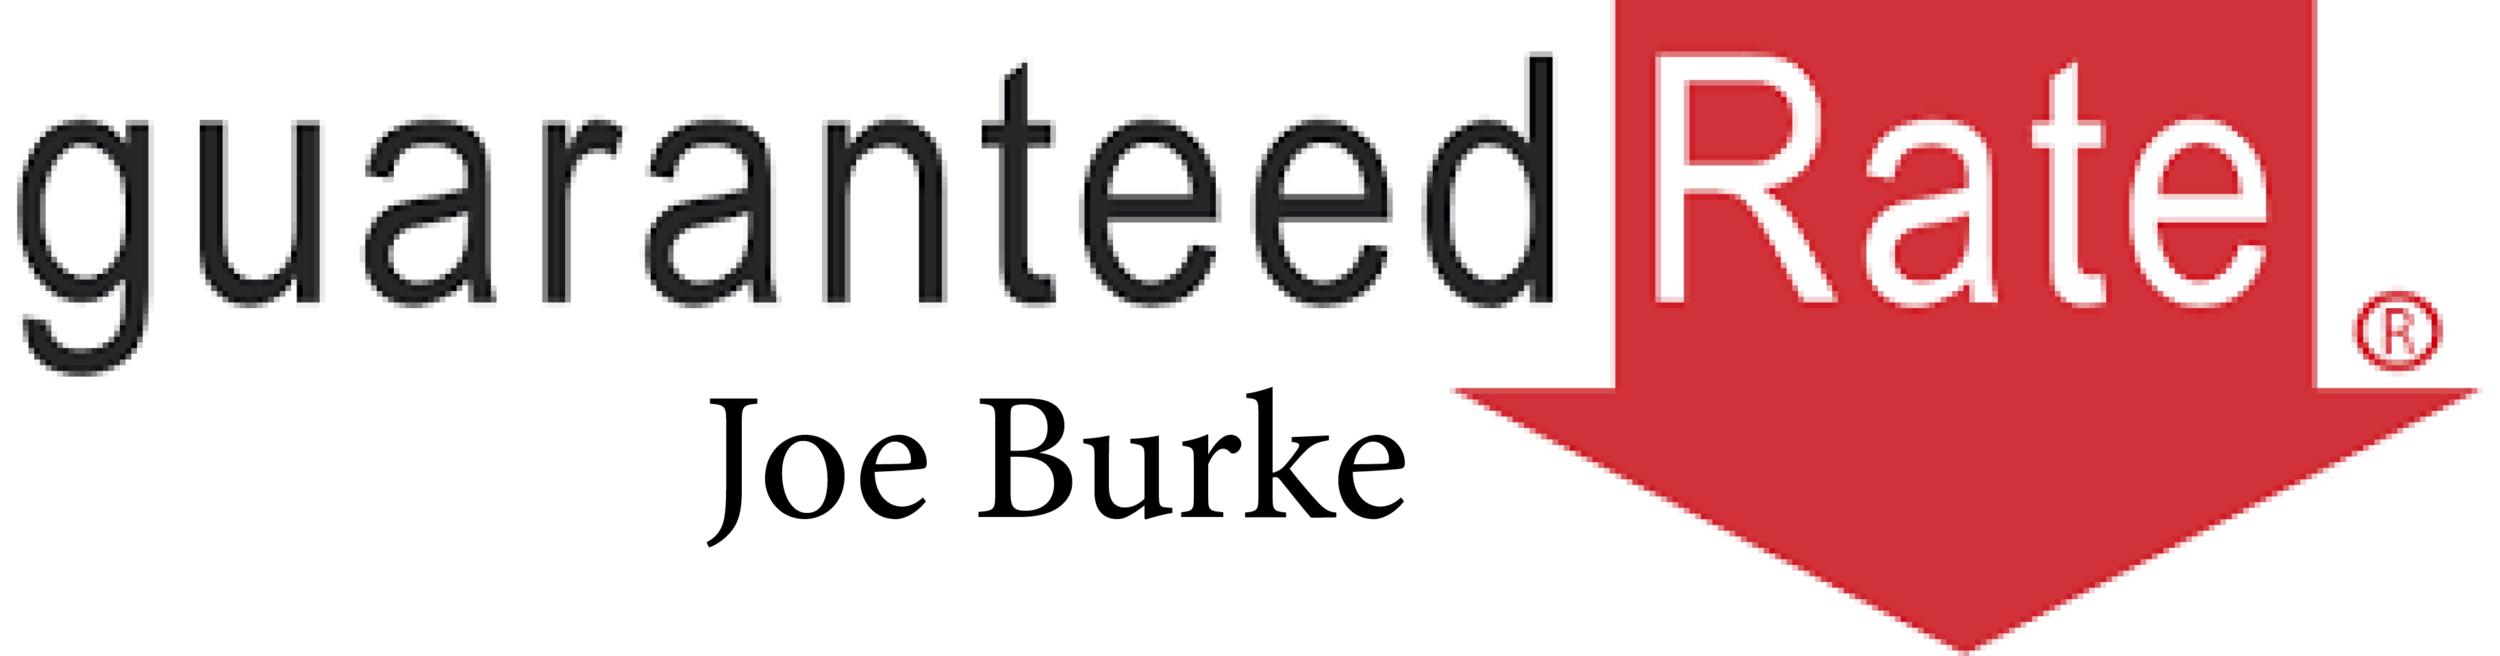 Guaranteed Rate Joe Burke.png